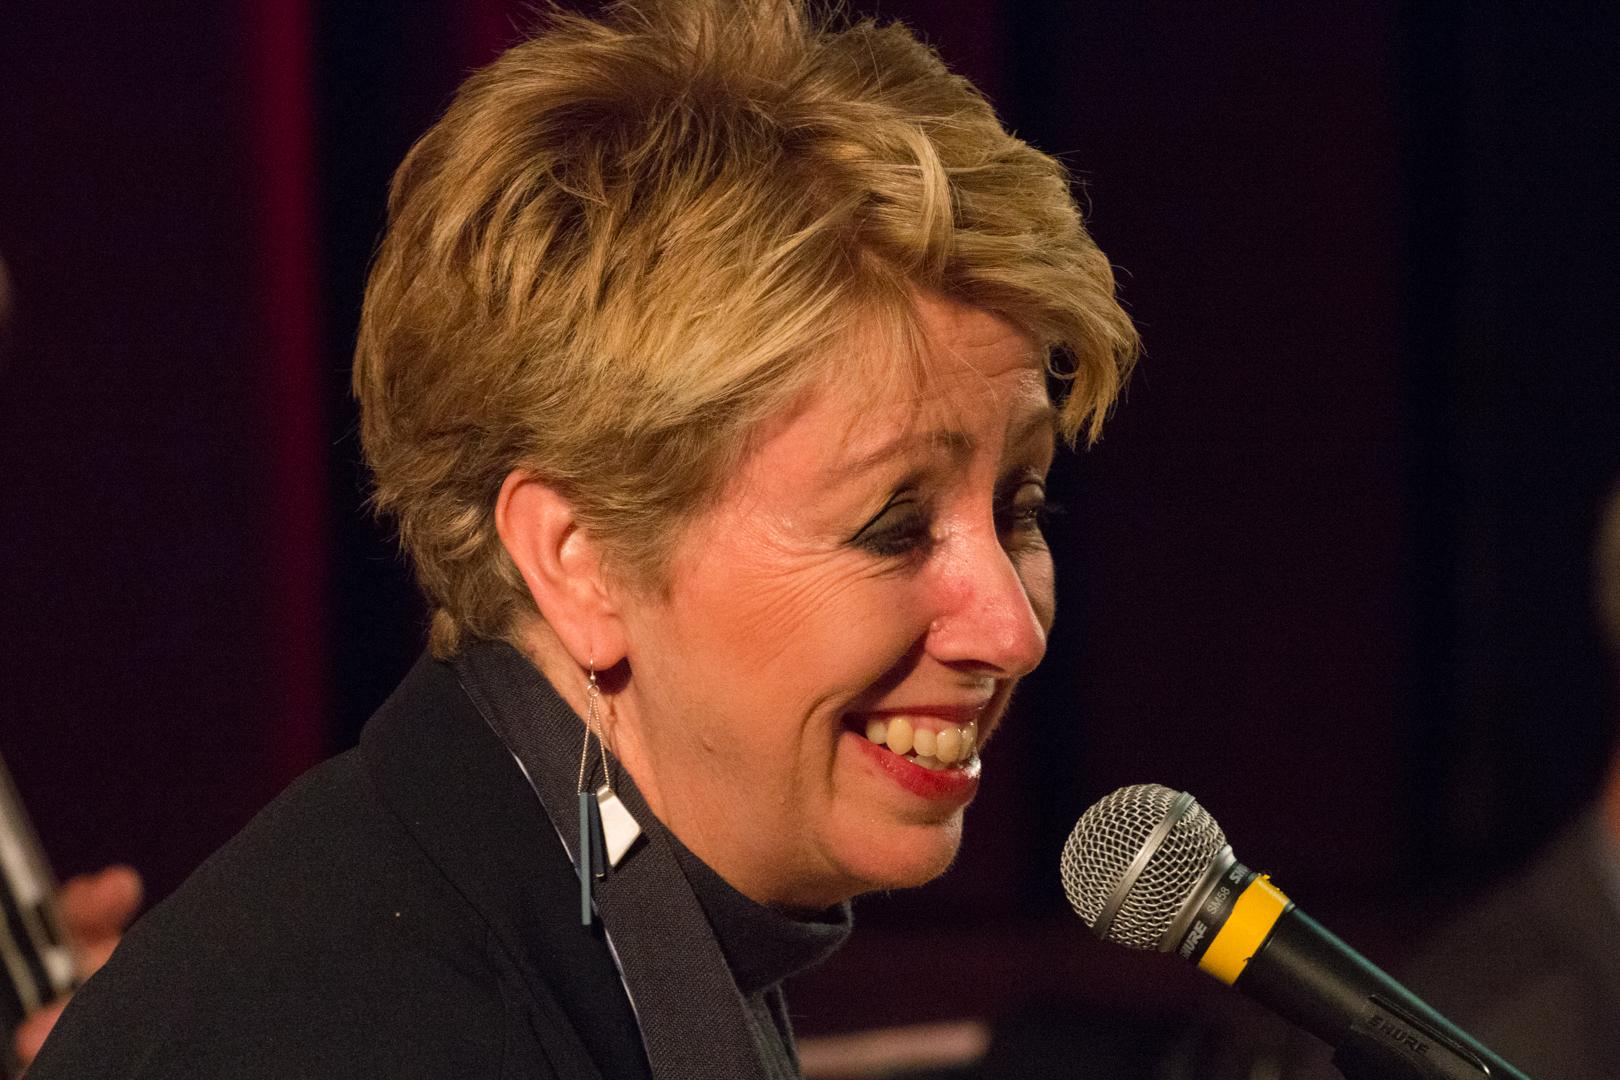 Nikki Iles performing at Fleet Jazz on 19th Feb 2019